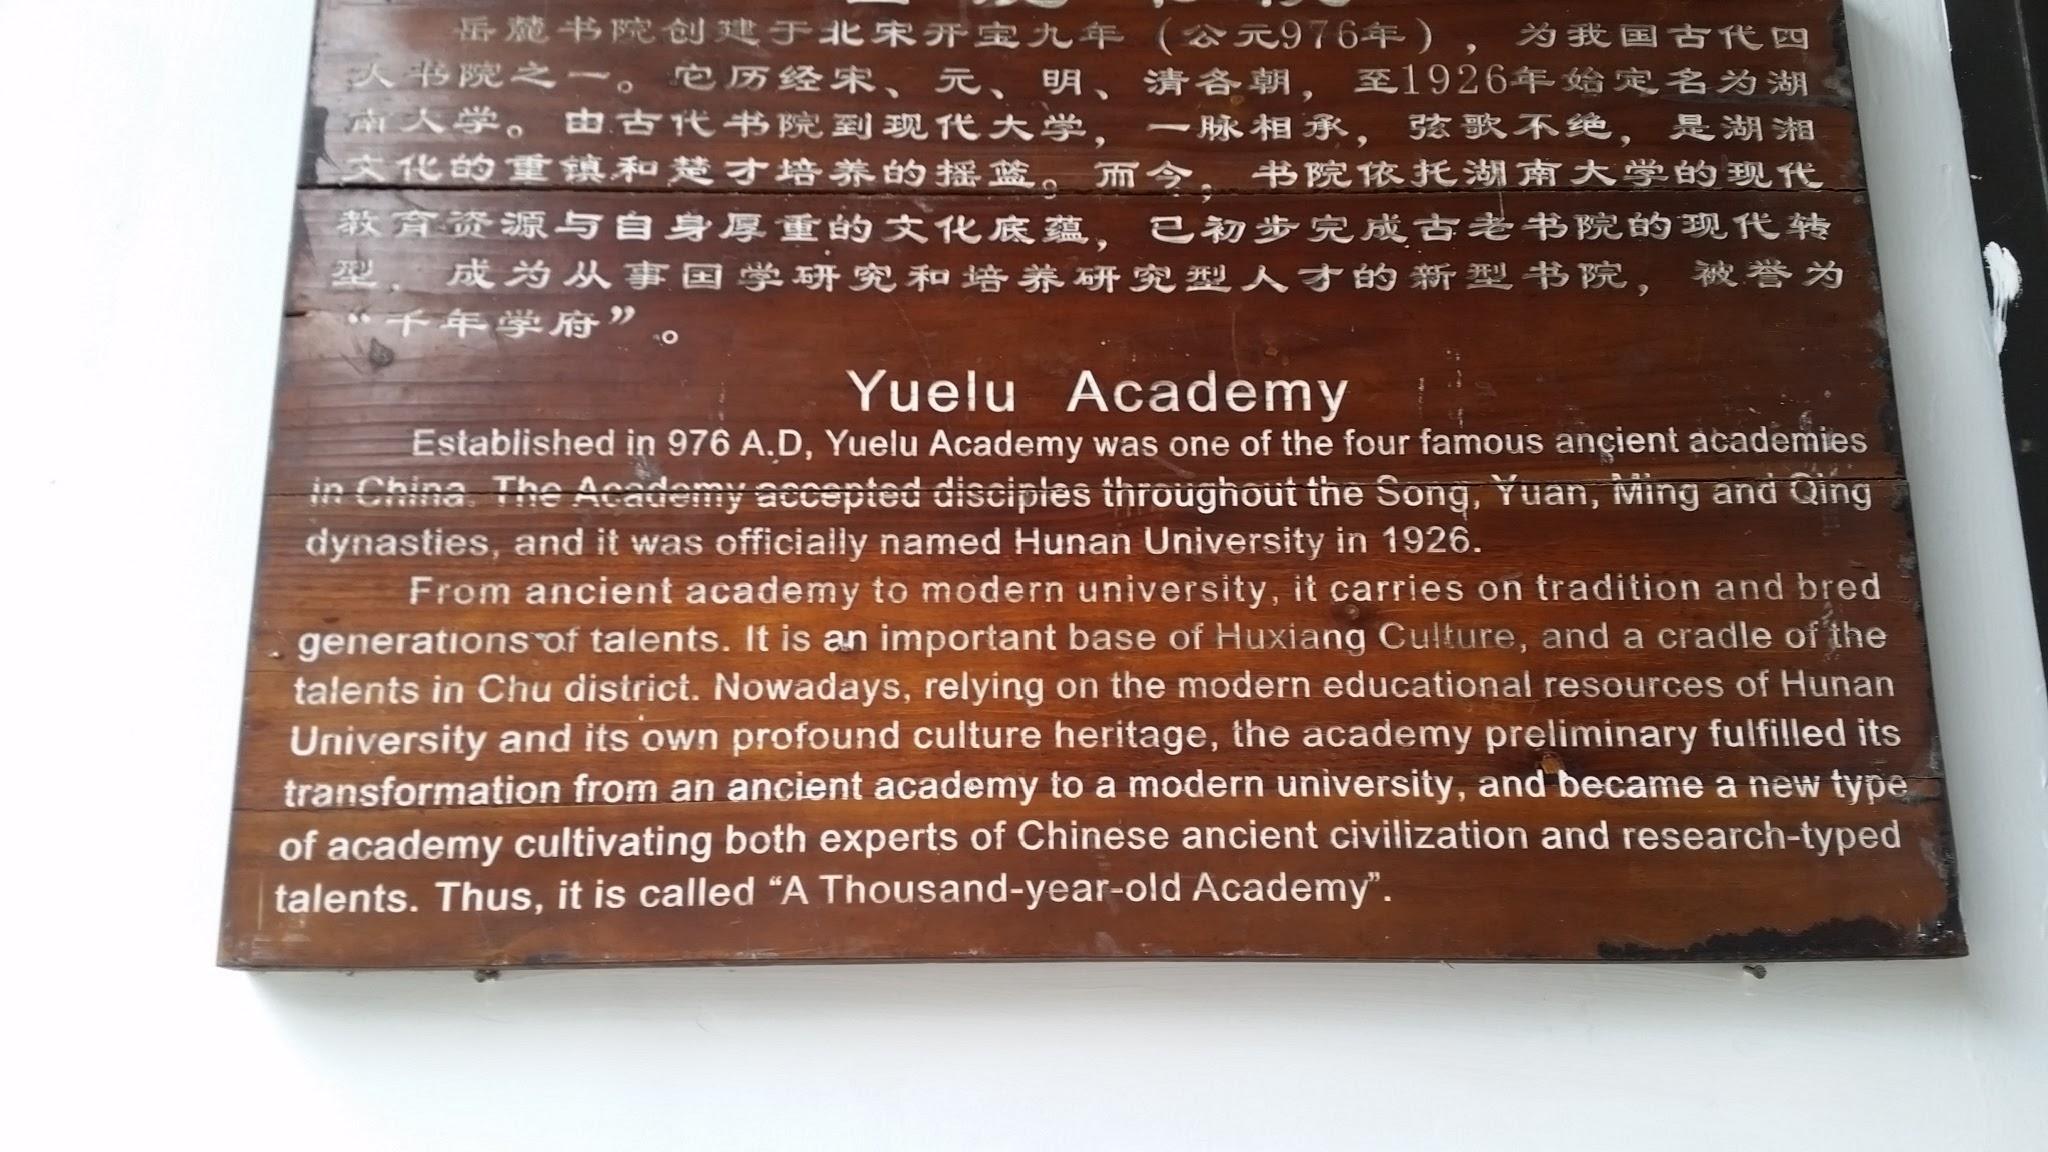 20151210_Yuelu academy.jpg